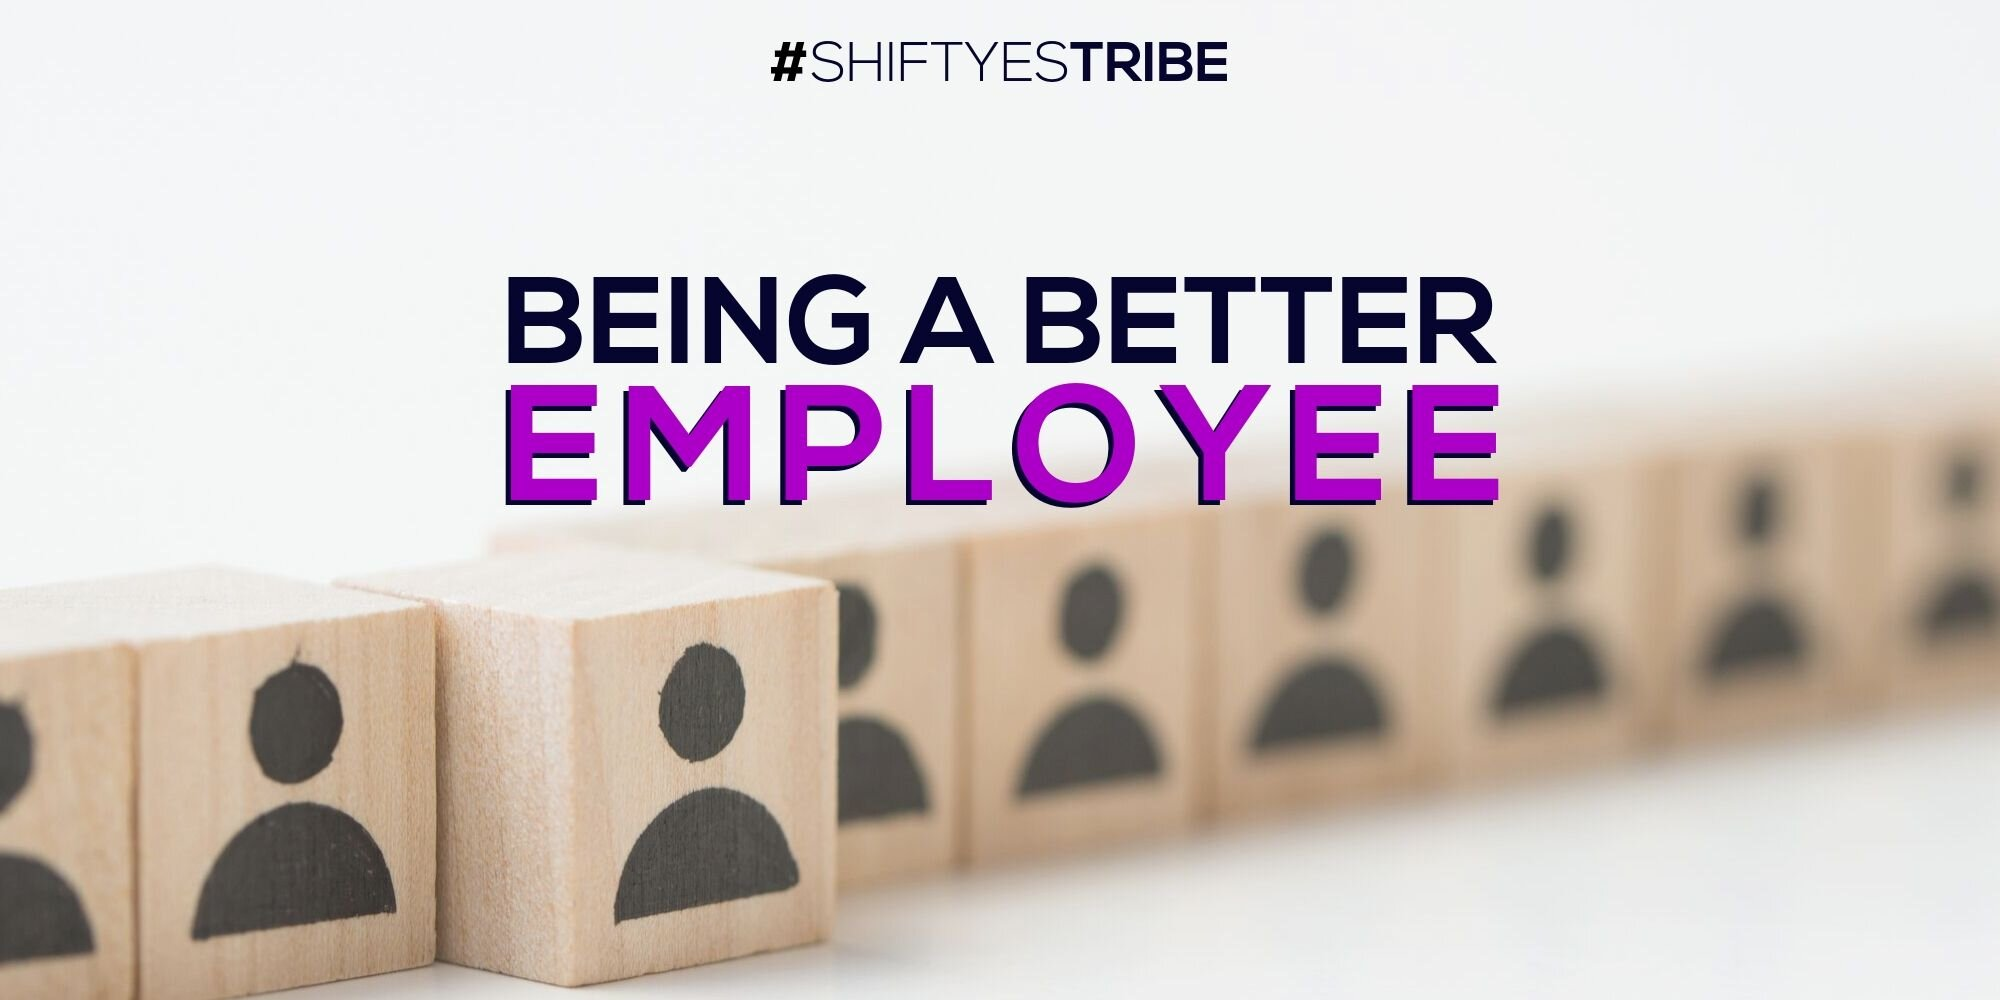 Galen Emanuele #shiftyestribe Shift Yes Tribe Being a better employee september 2019.jpg